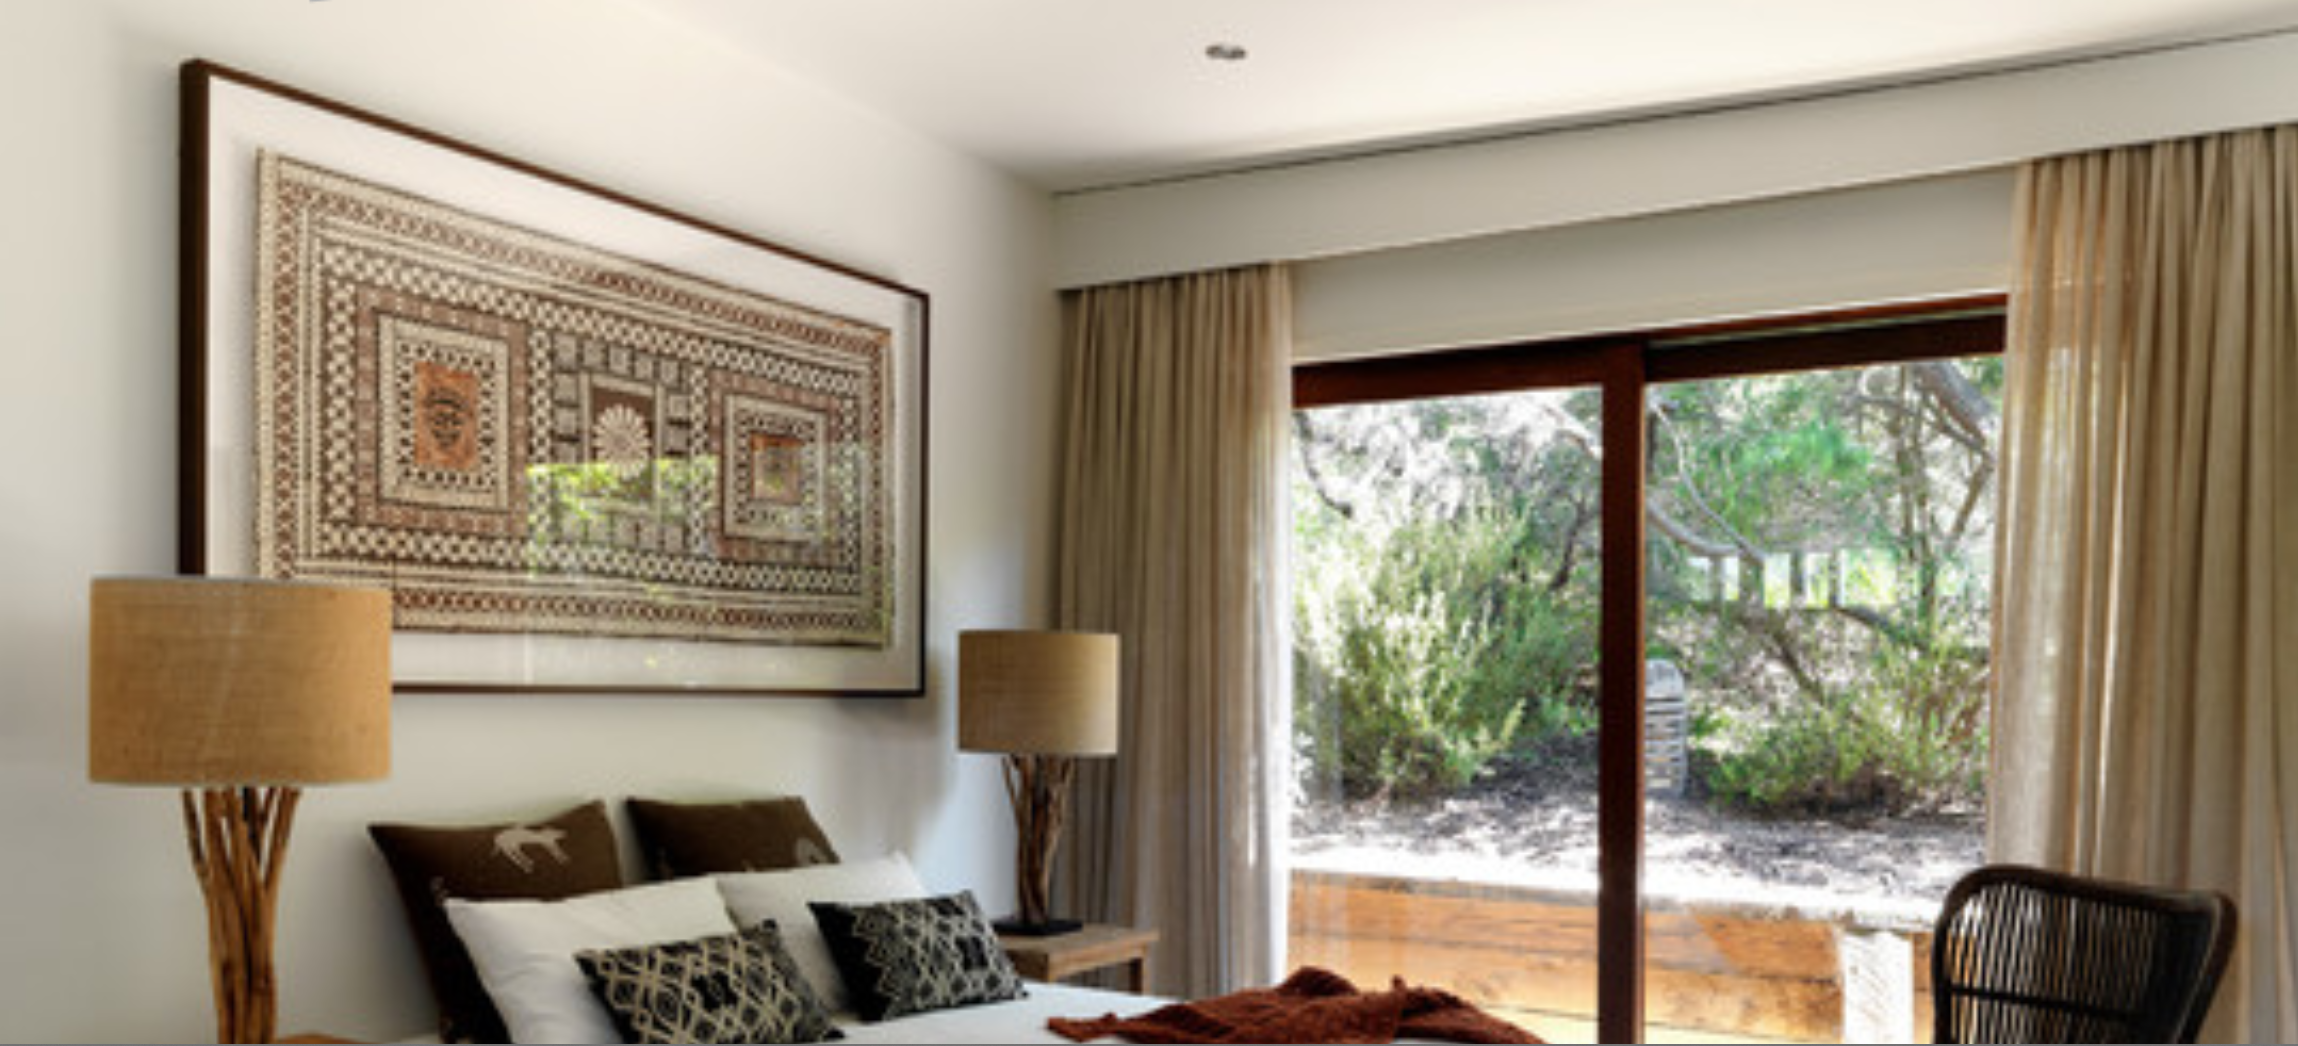 Framed Rug Home Wall Decor Home Frames On Wall